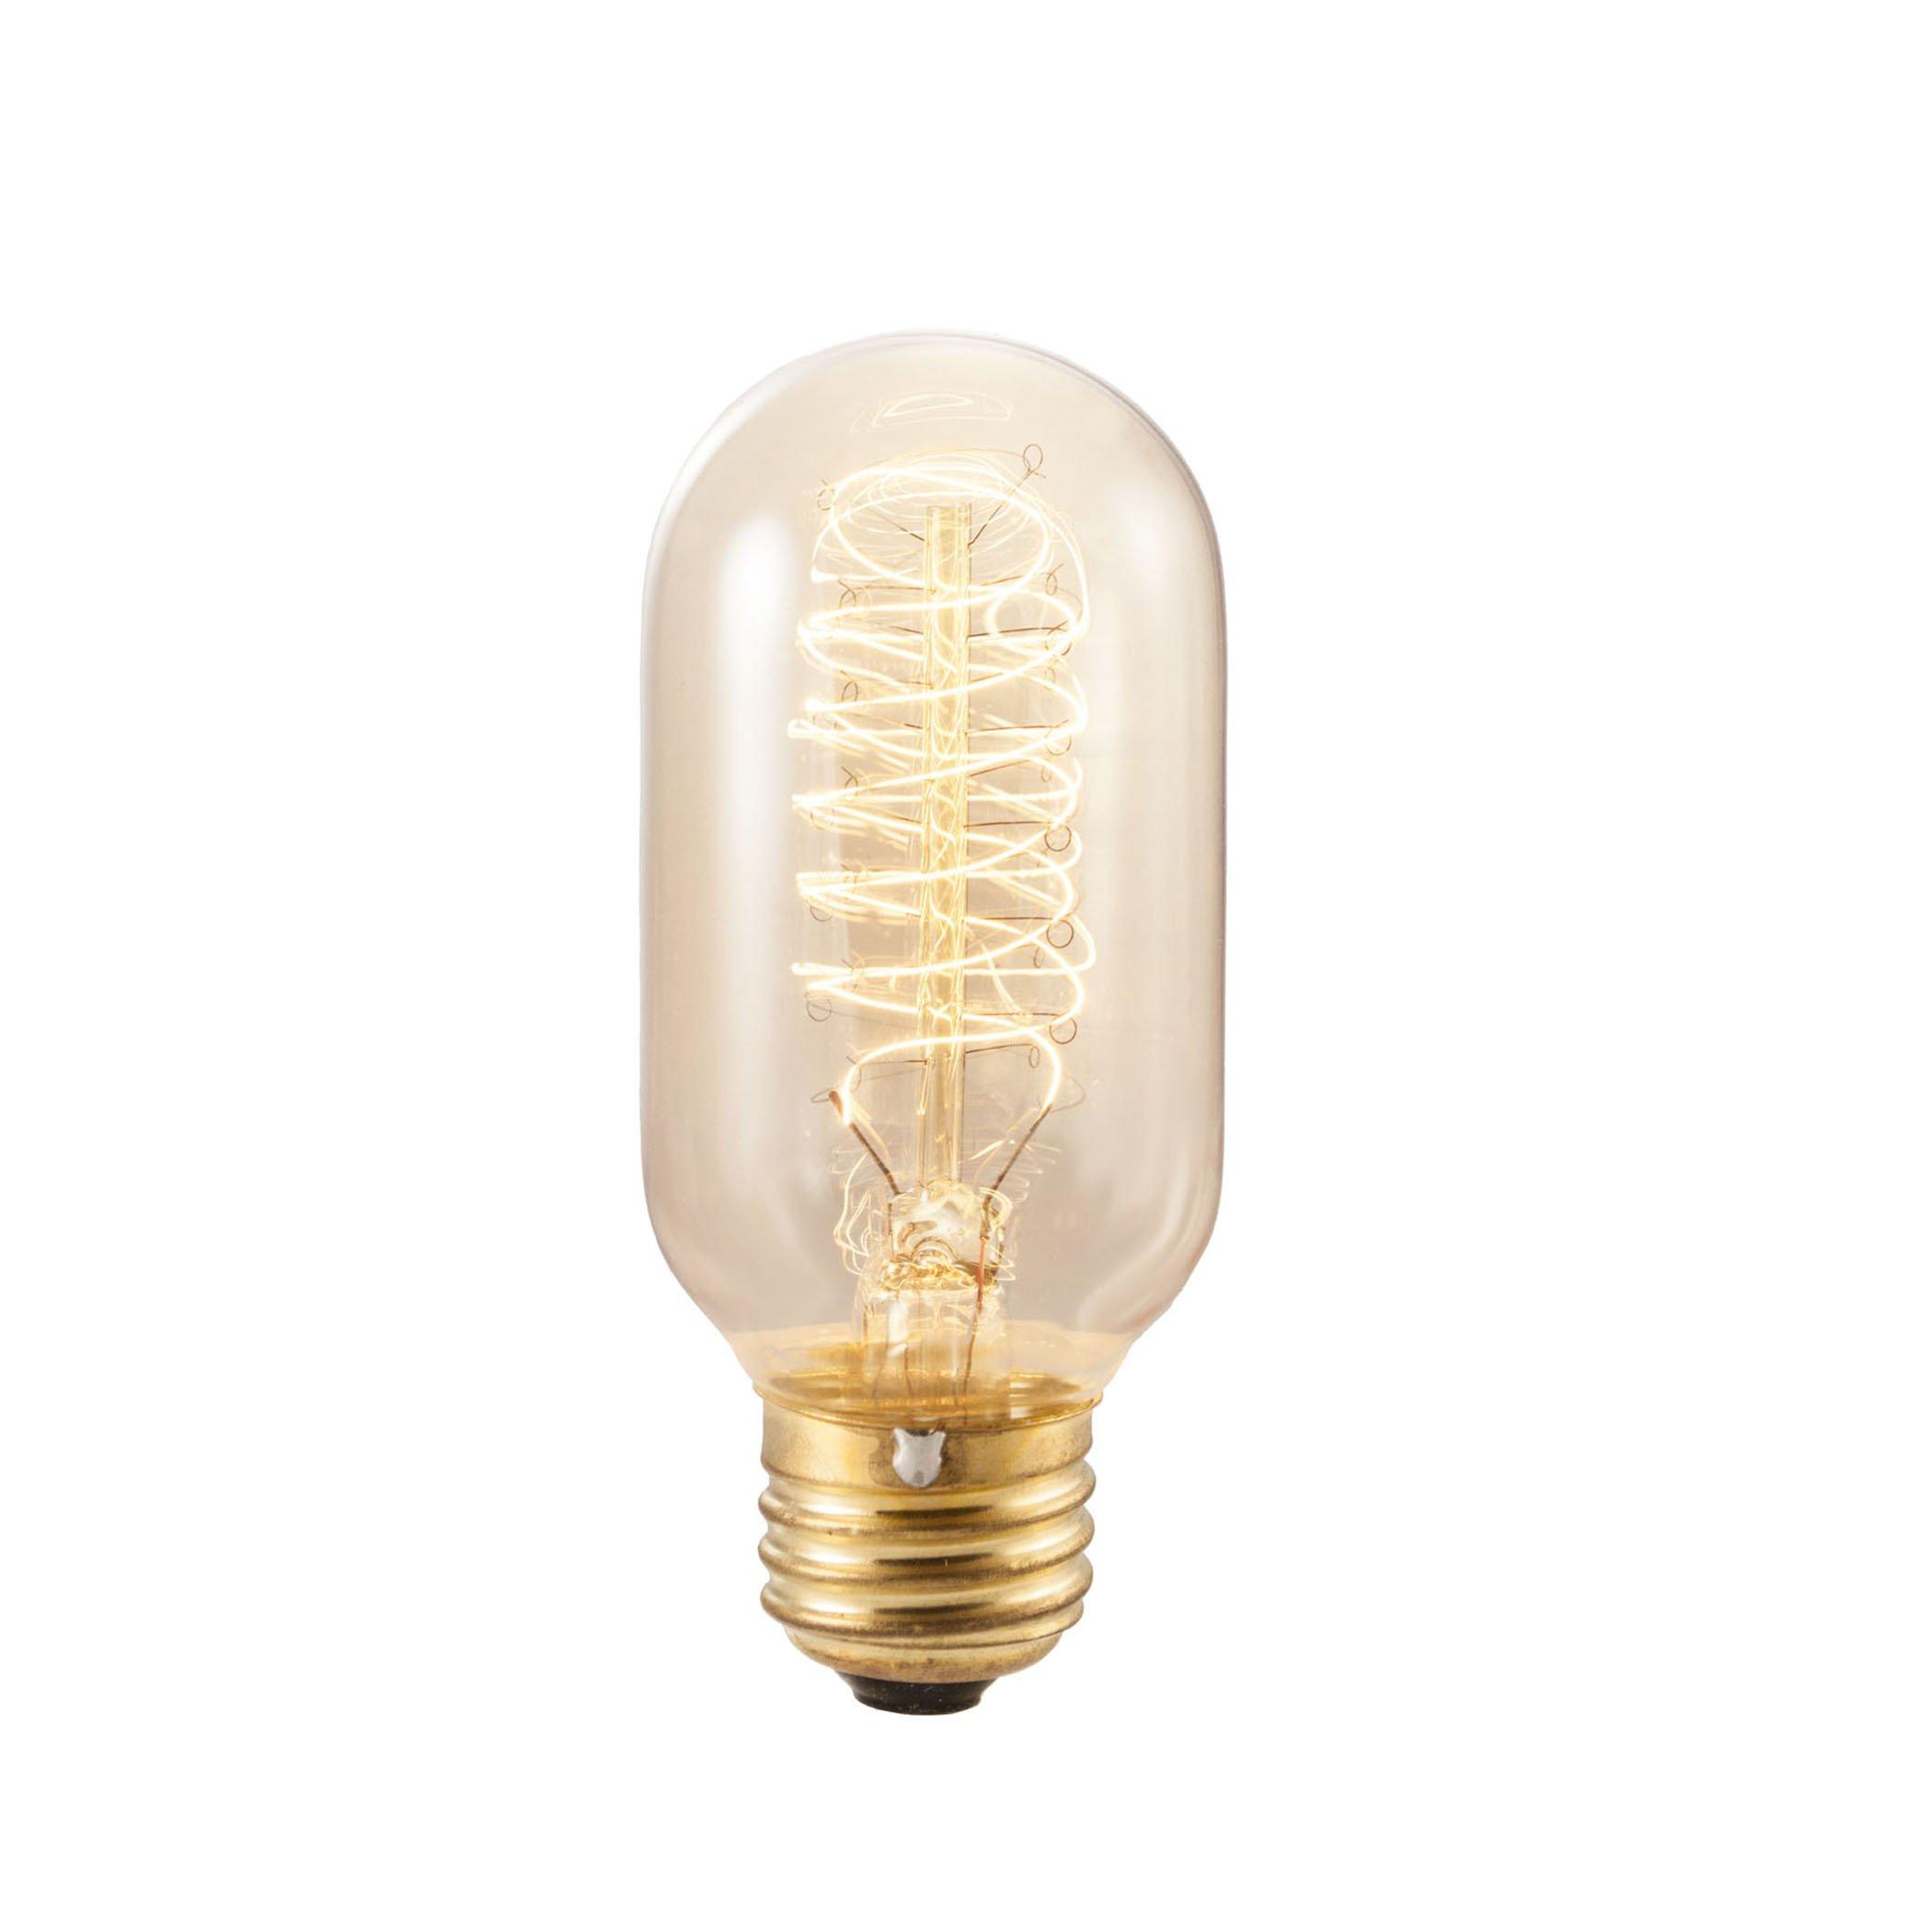 20 Qty. Bulbrite NOS40T14 40-Watt Nostalgic Incandescent Edison Torch Spiral T14, Medium Base, Antique Bulb